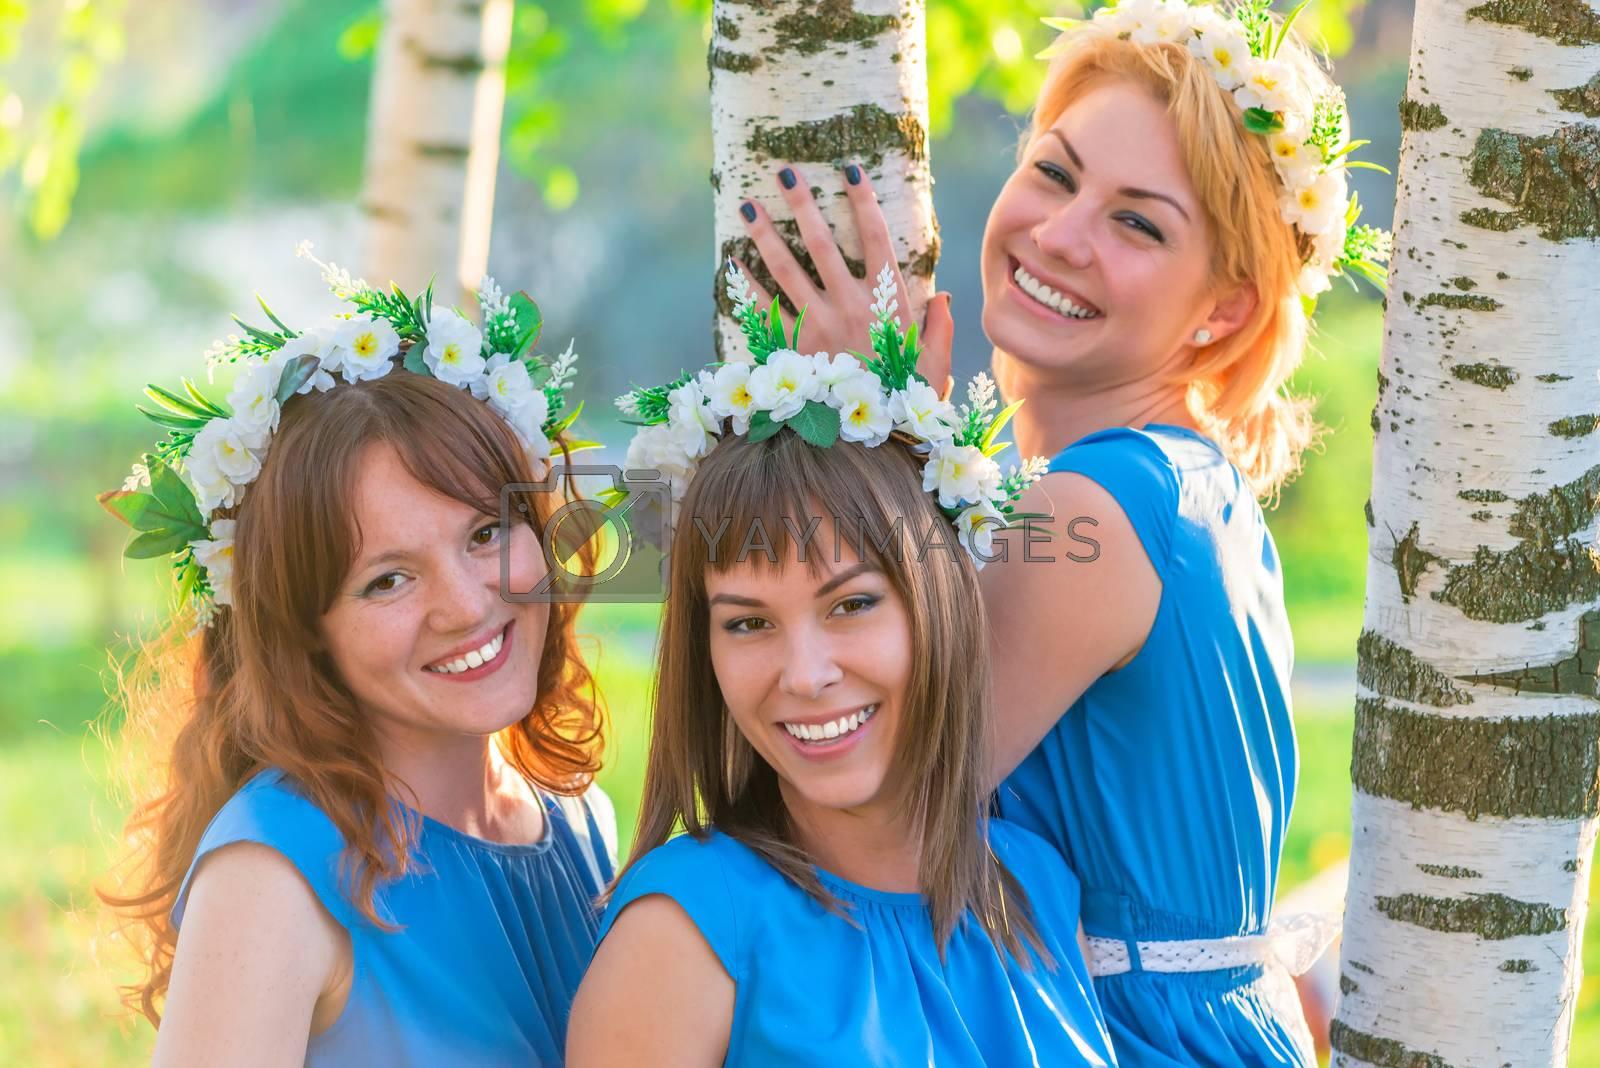 happy girlfriends posing near birch in the spring park